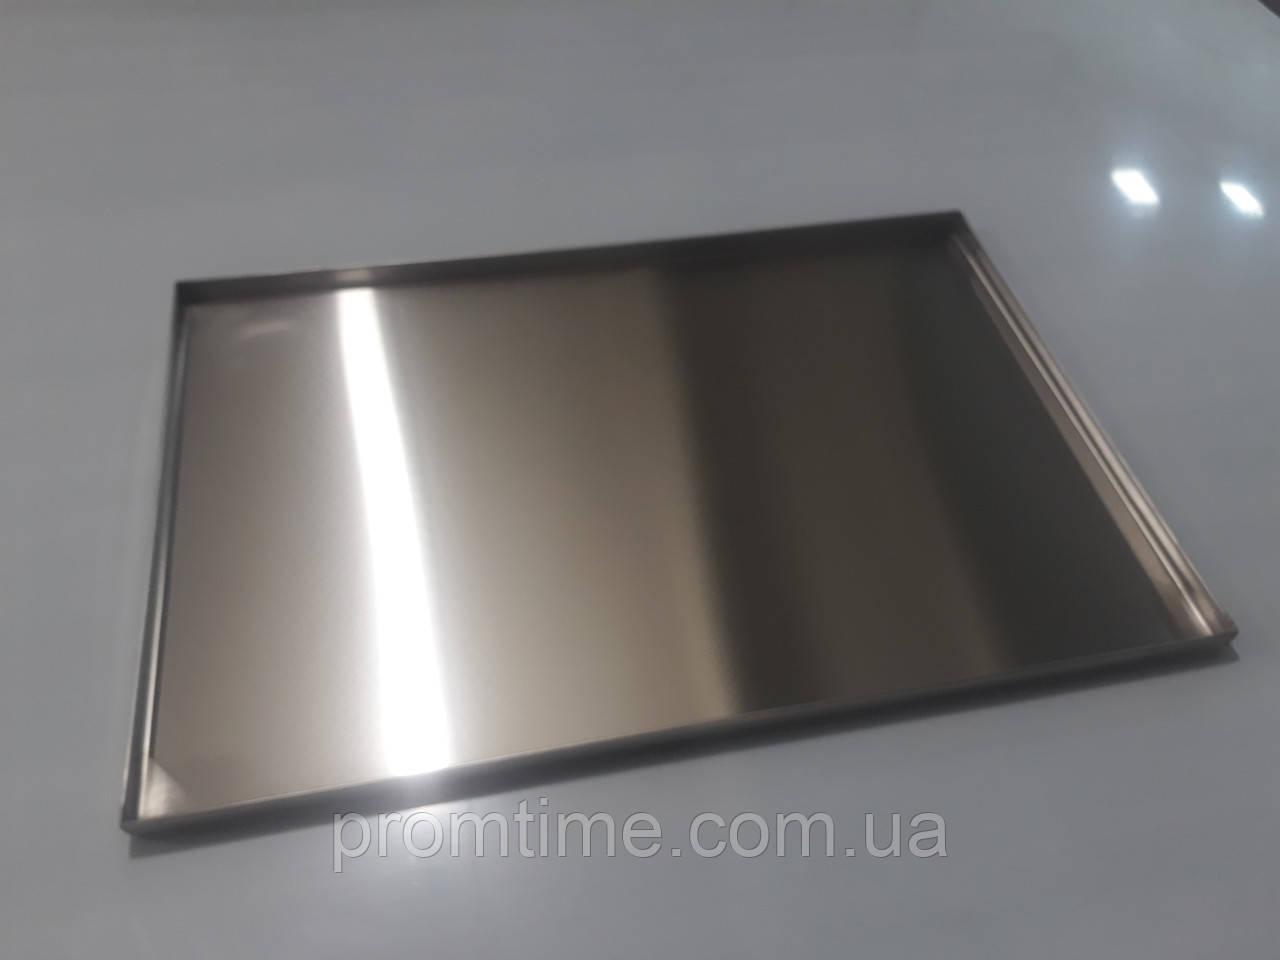 Противень 600х400х20 (нержавеющая сталь)